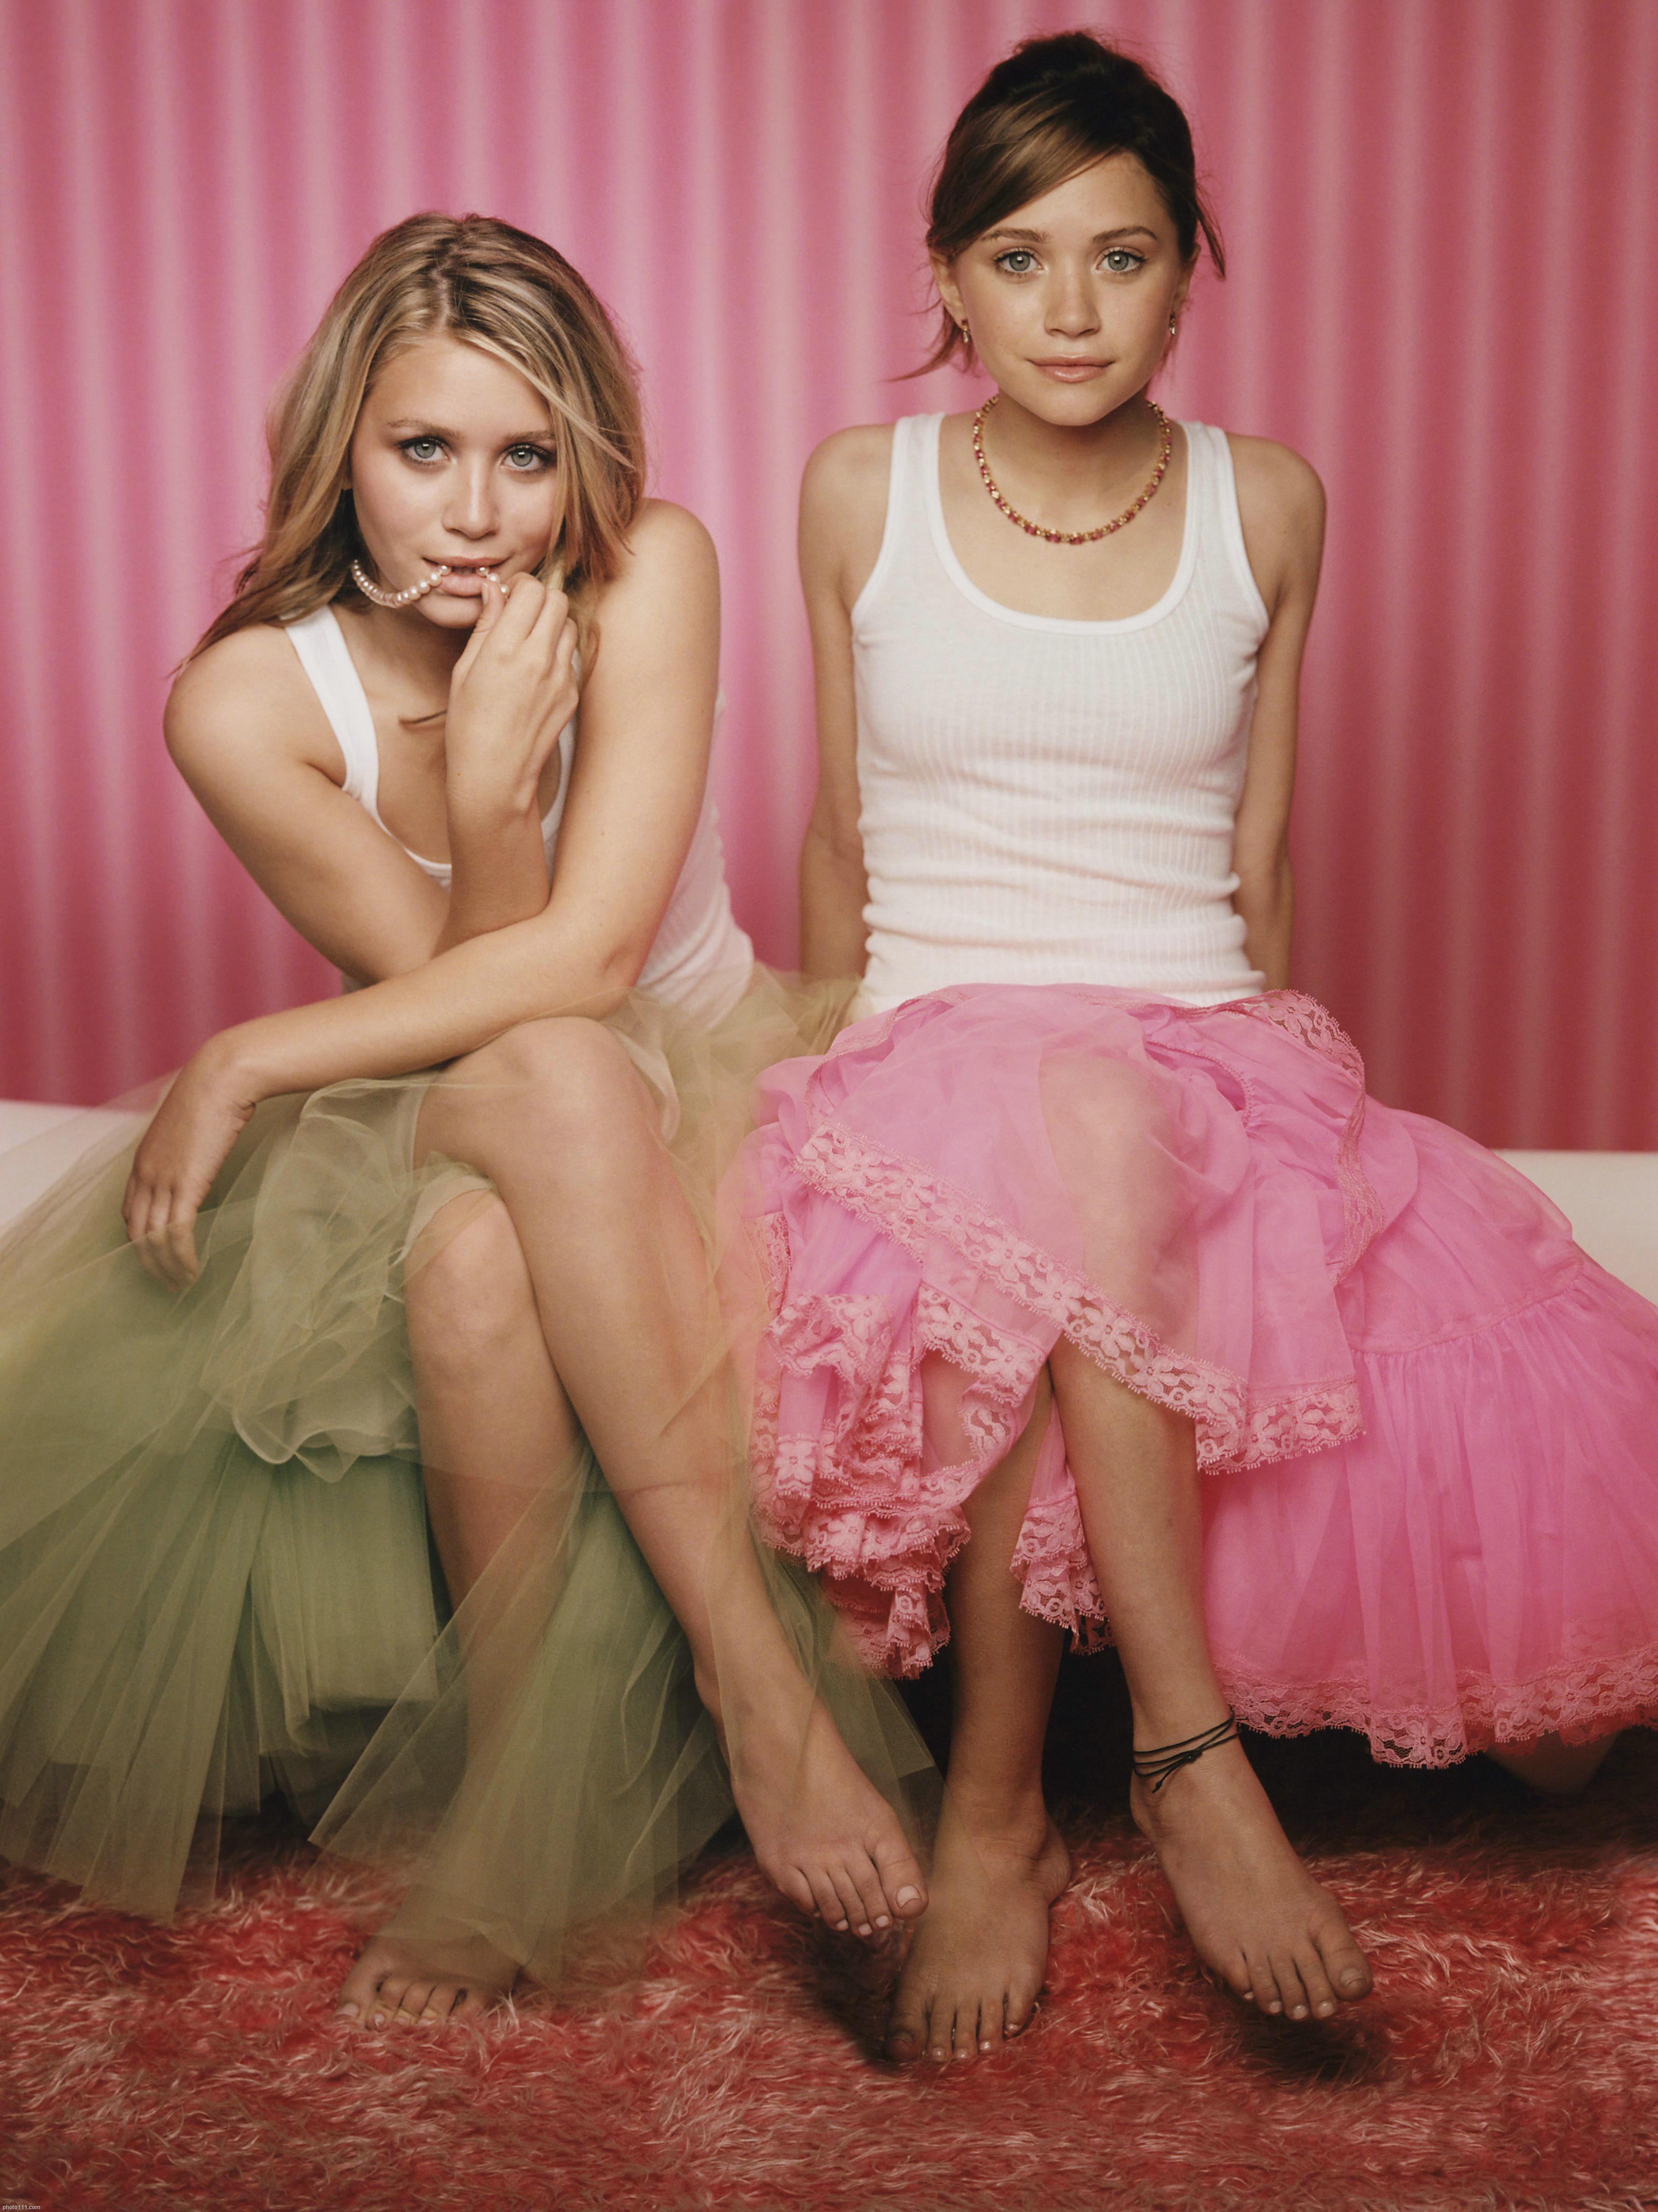 Photo 10 of 77 Mary Kate and Ashley Olsen   Olsen Twins 3550x4736